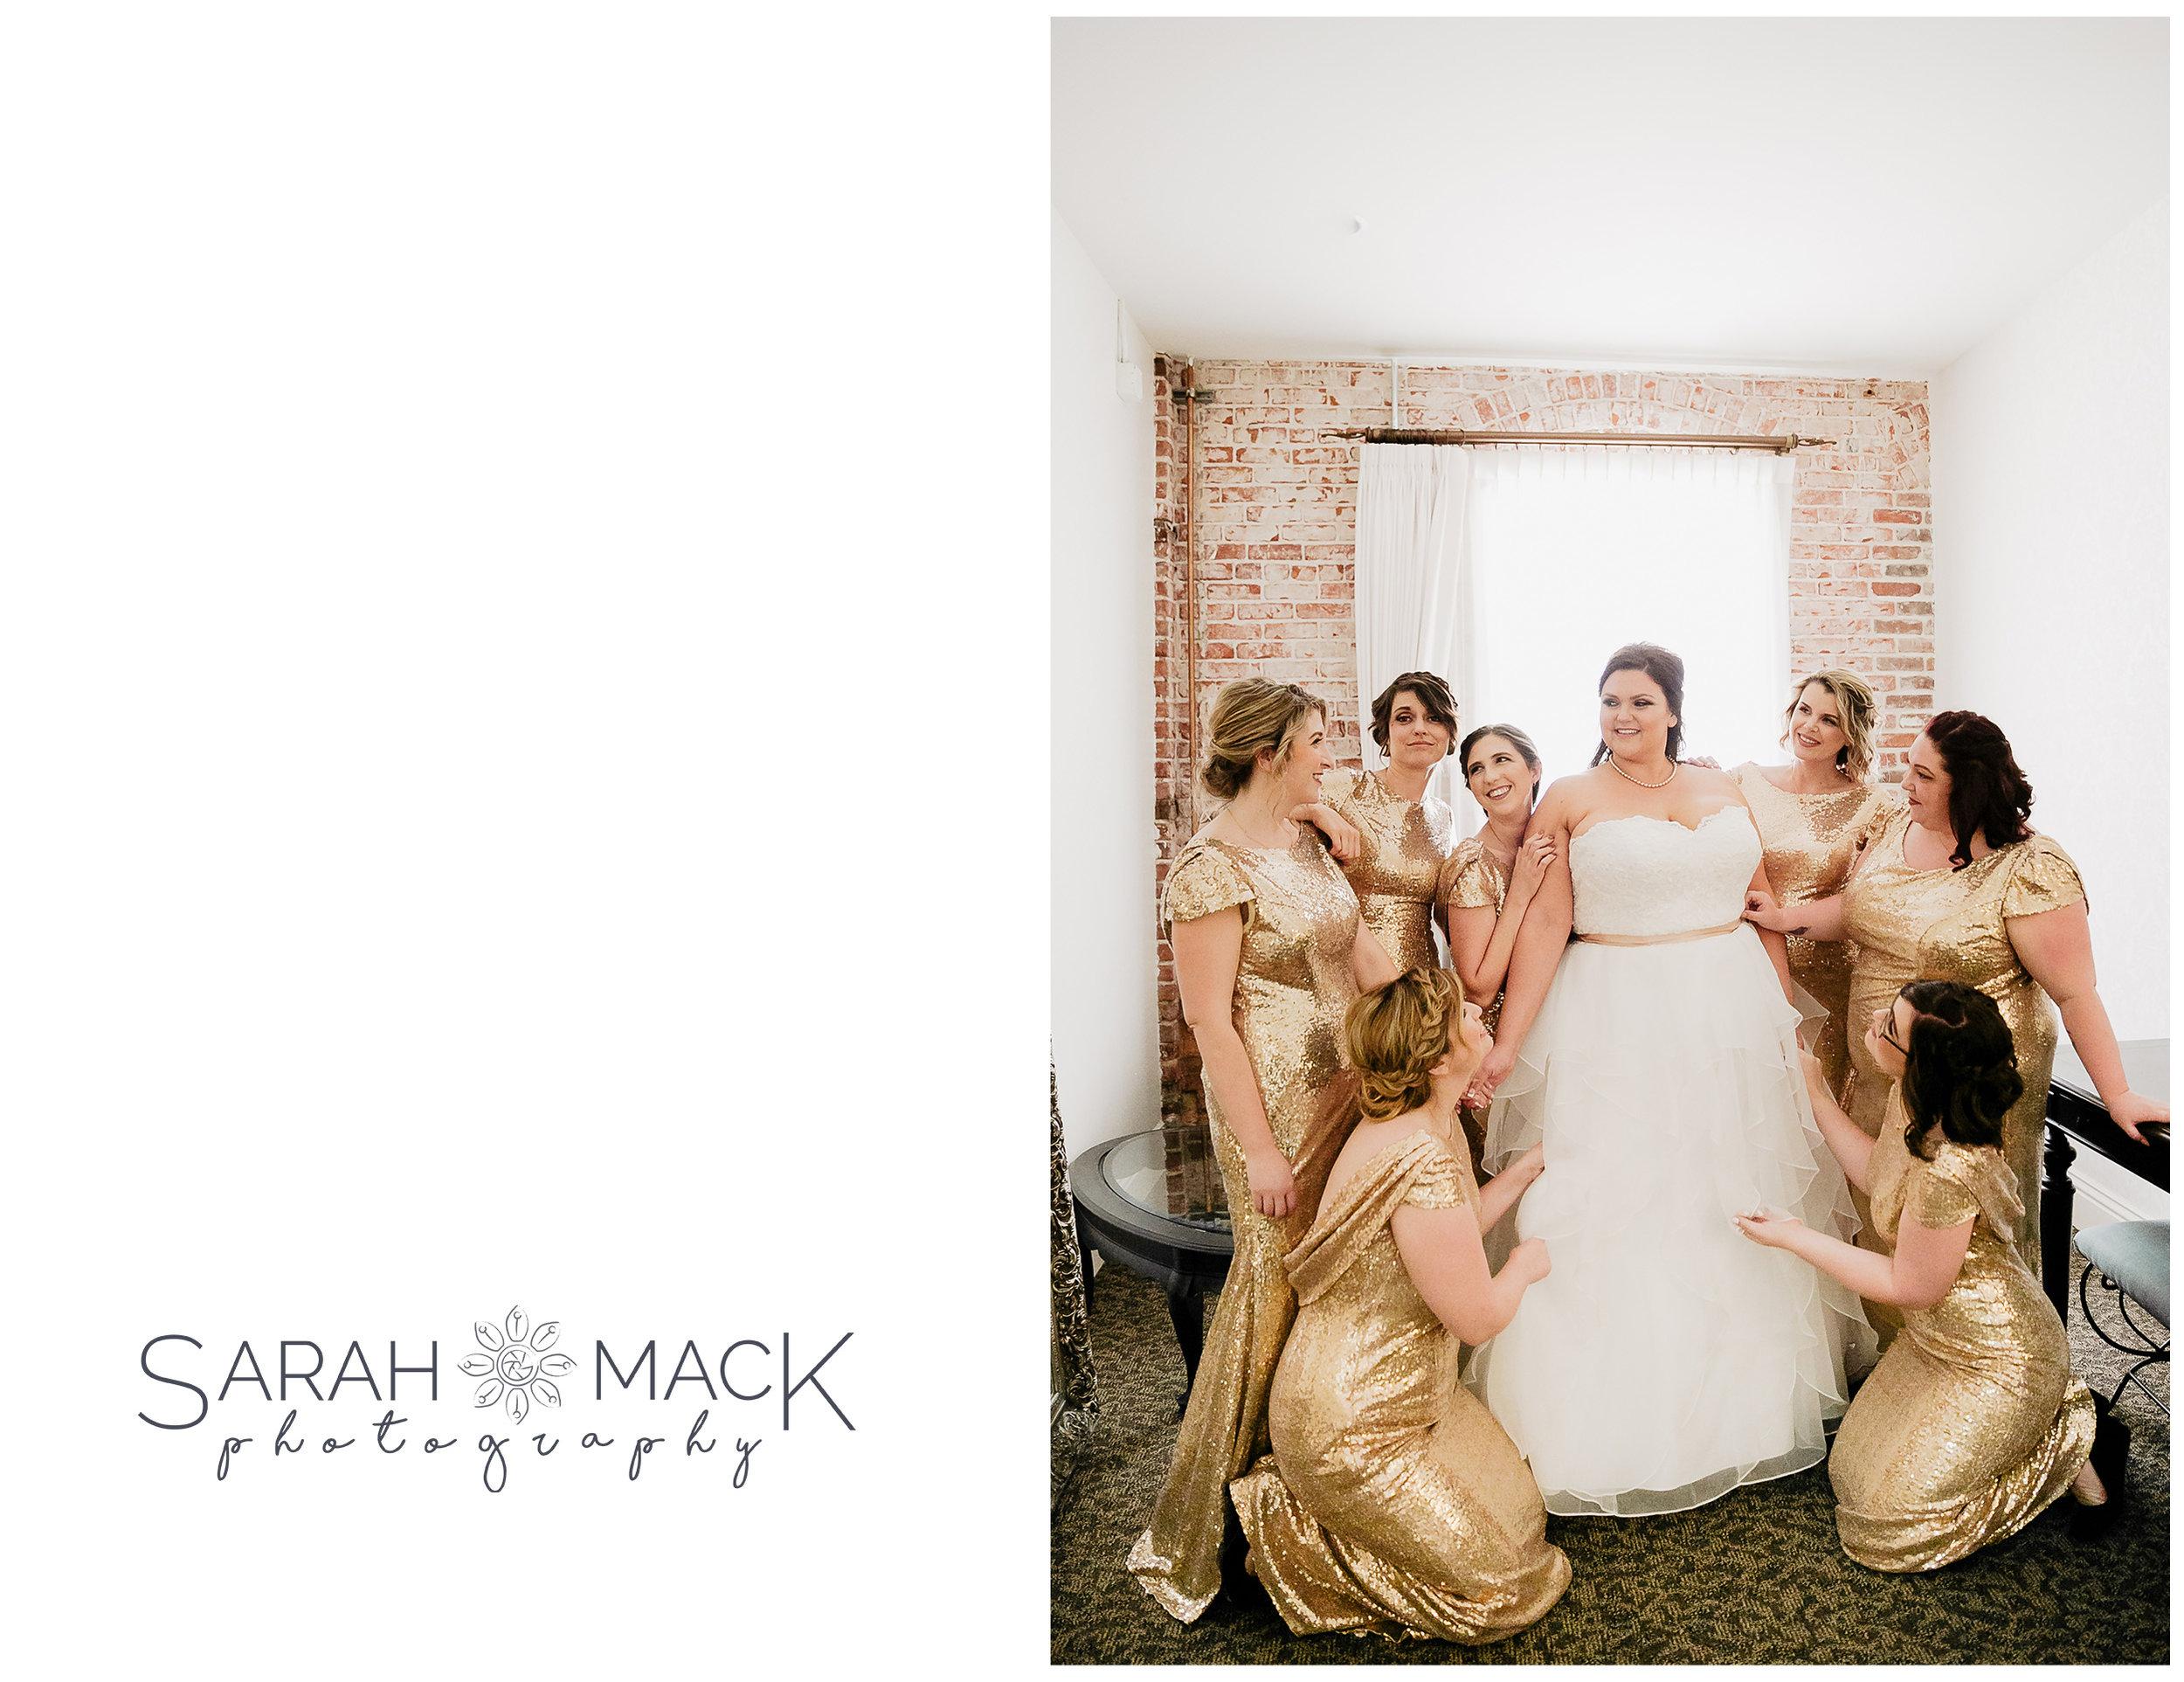 RF-Estate-on-Second-Santa-Ana-Wedding-Photography-7.jpg